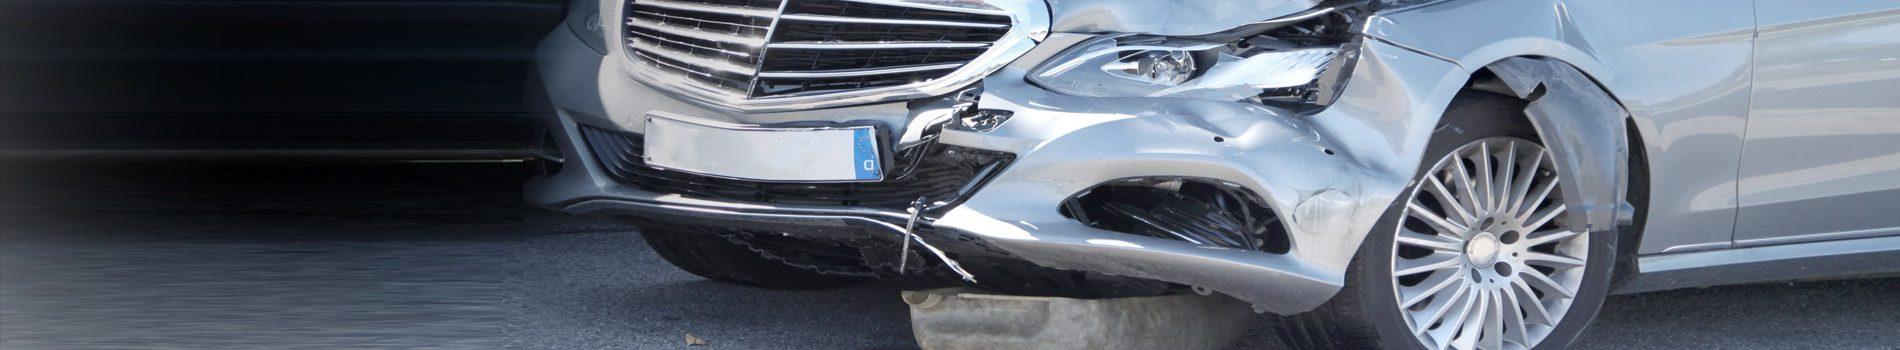 Fahrzeuglackierung Triptrap, Wesel, Wulfen, Schermbeck - Unfallinstandsetzung, Reaparatur, Smart-Repair